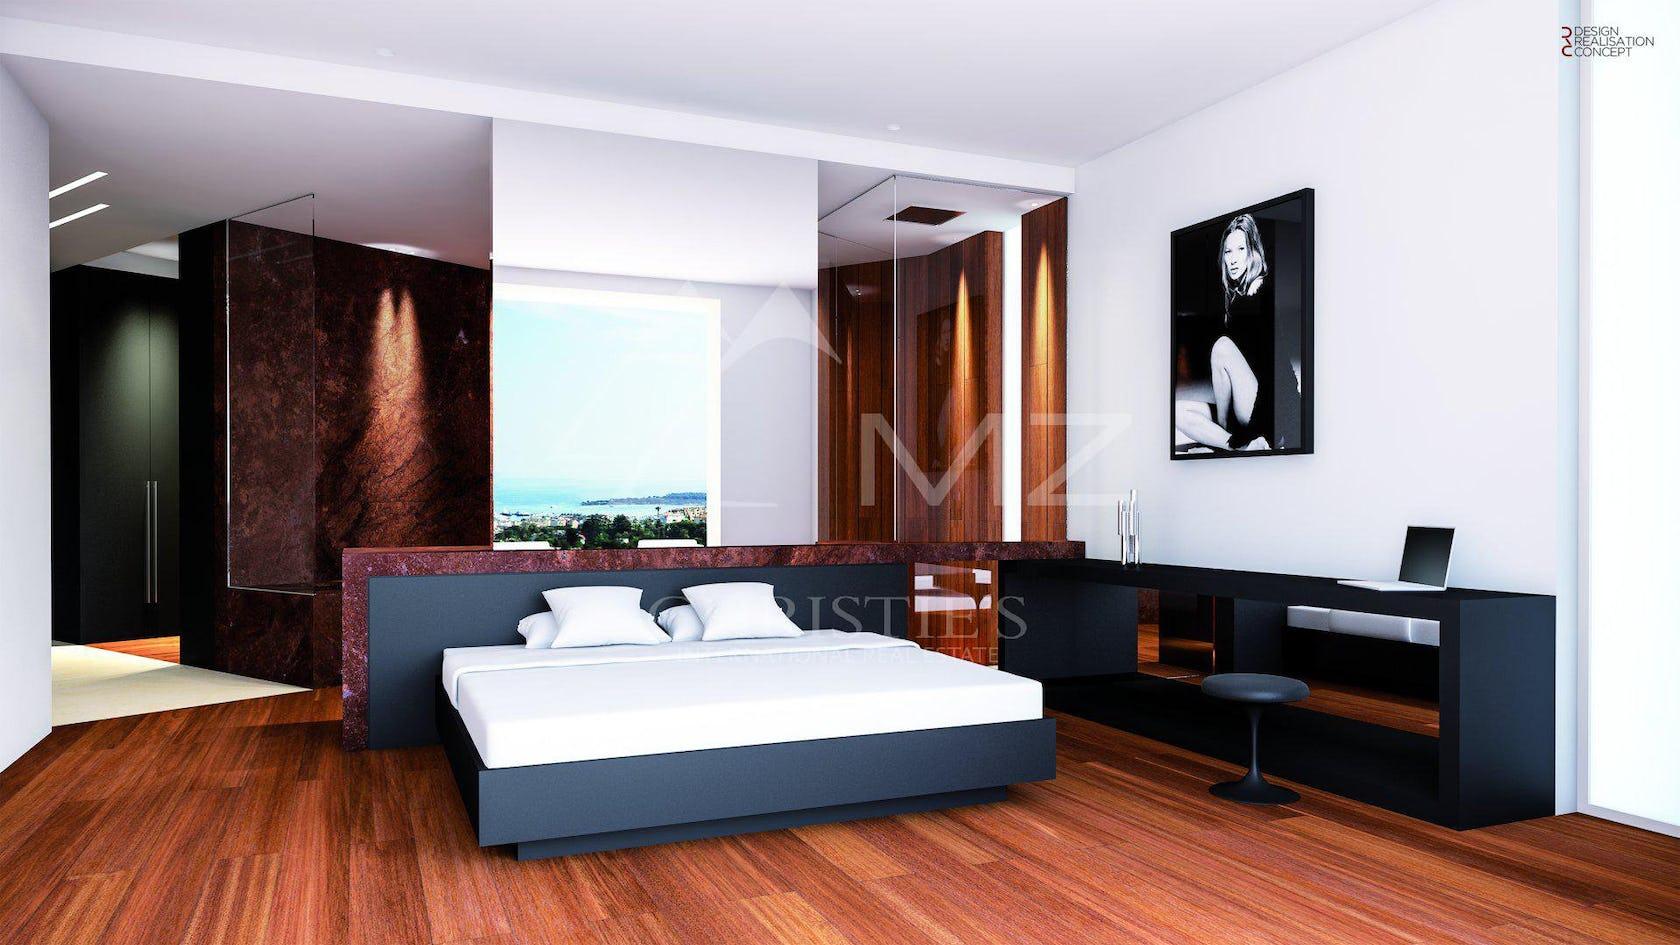 flooring furniture wood hardwood bedroom room indoors floor interior design